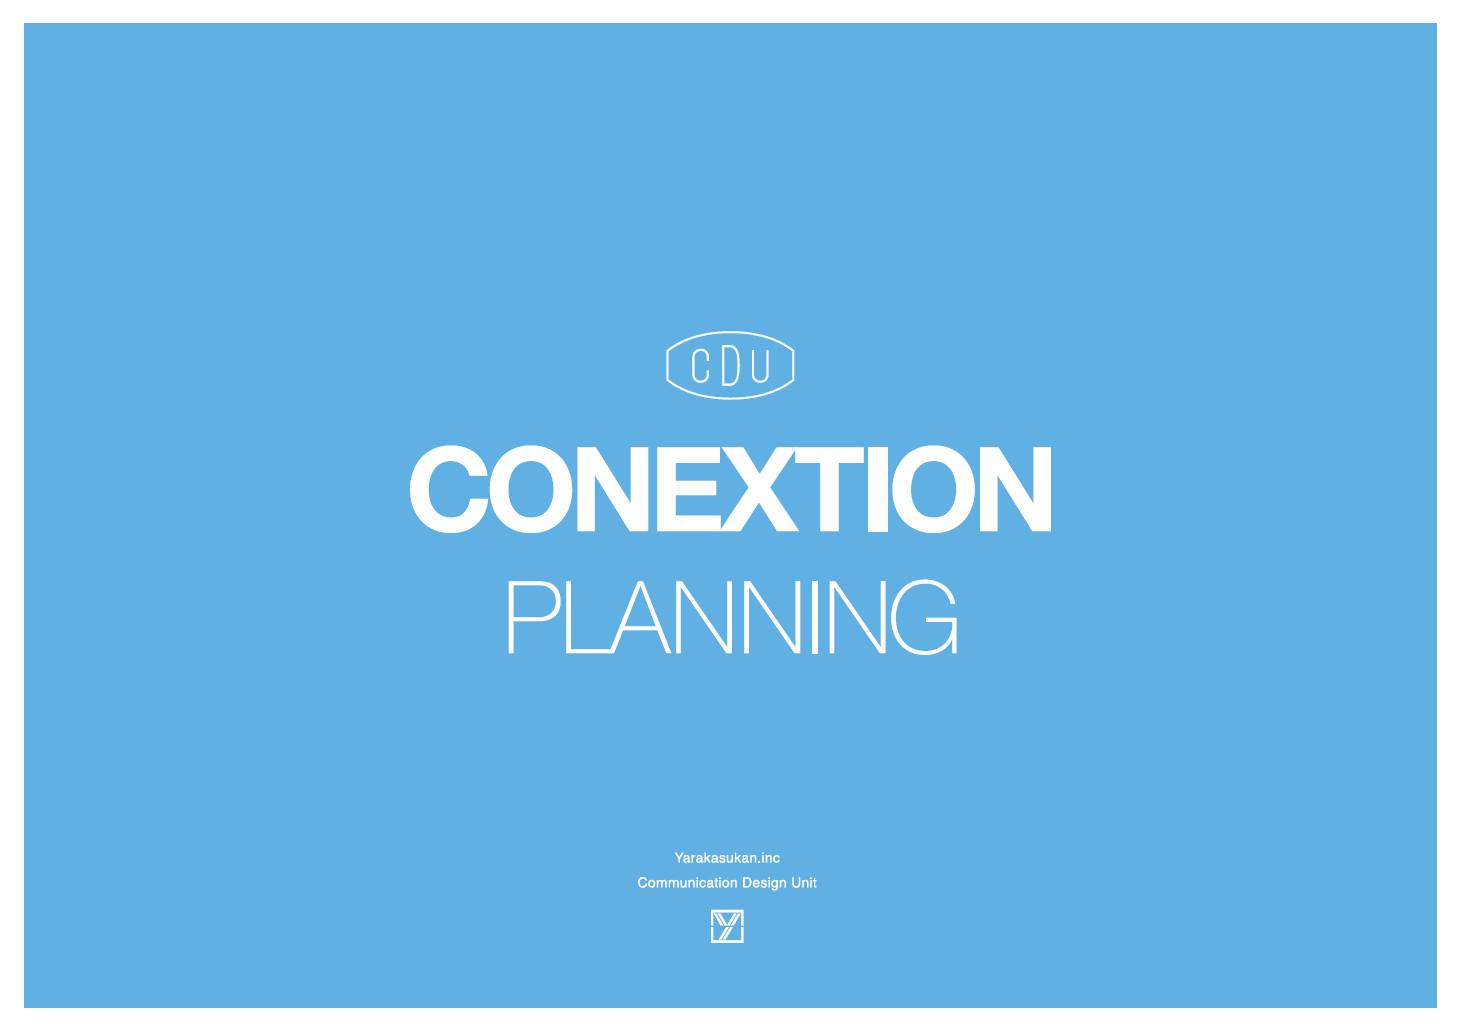 CONEXTION PLANNING DOCUMENT